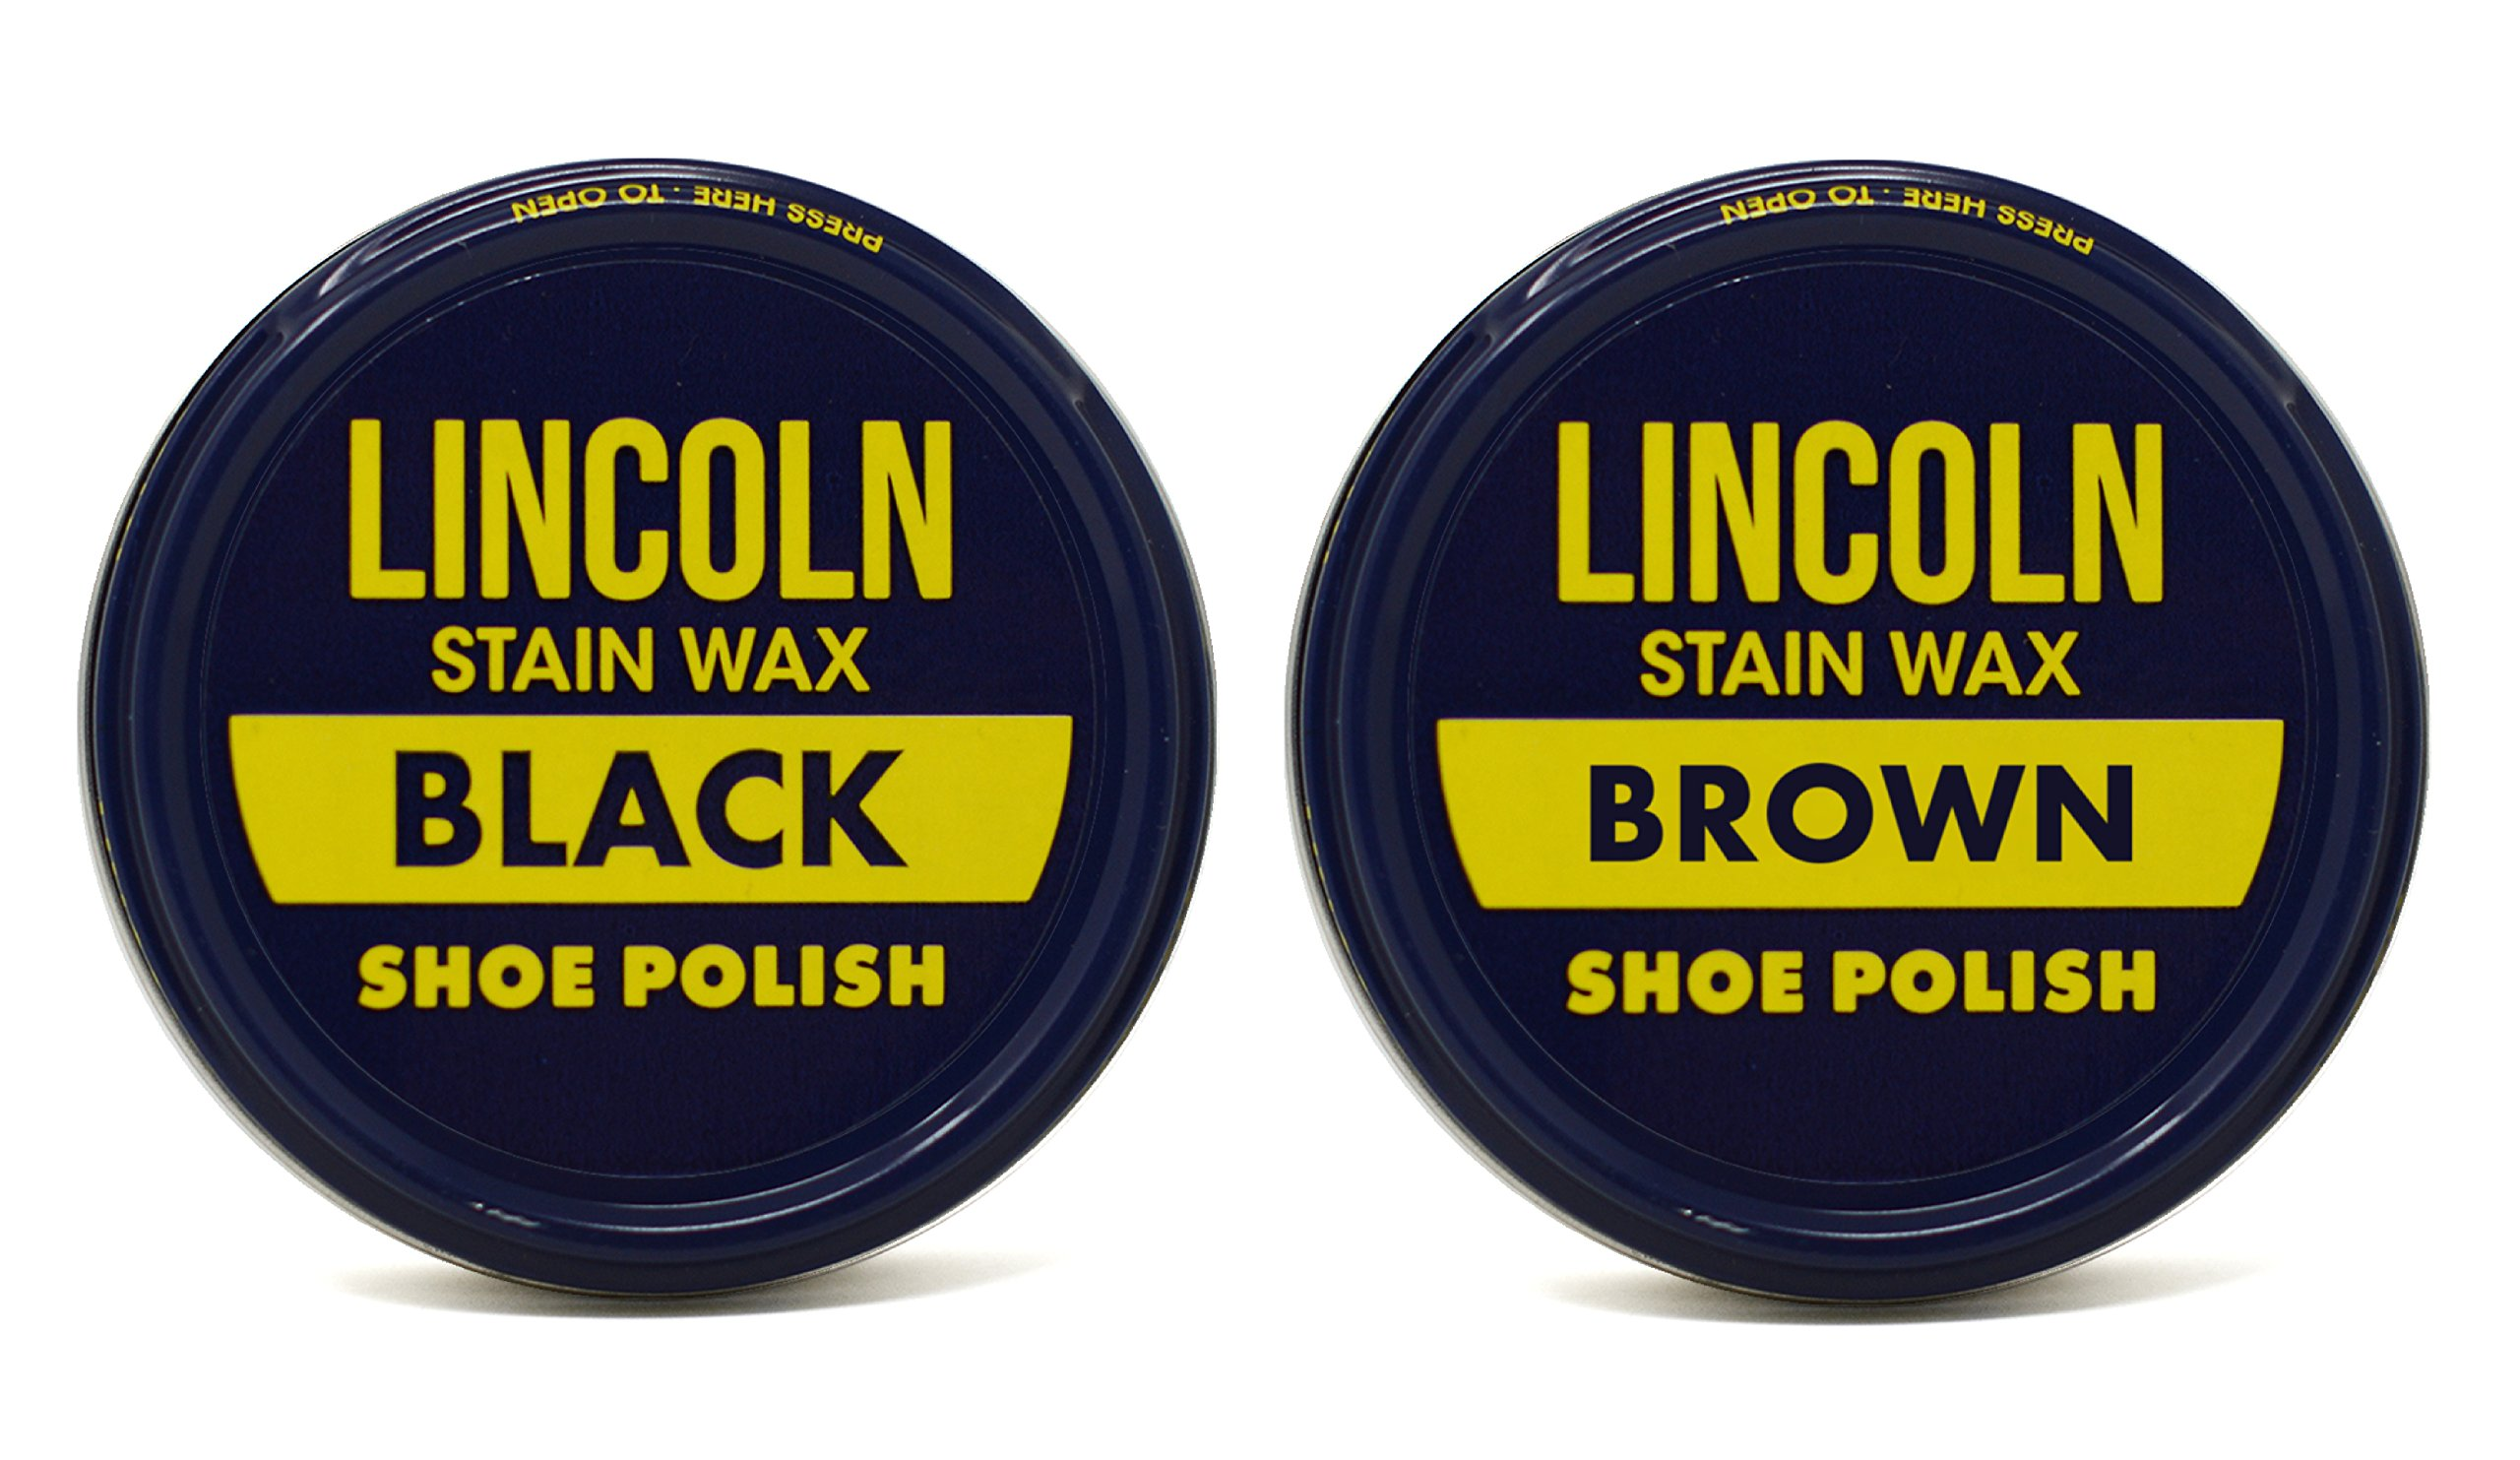 Lincoln Stain Wax Shoe Polish (Black/Brown)